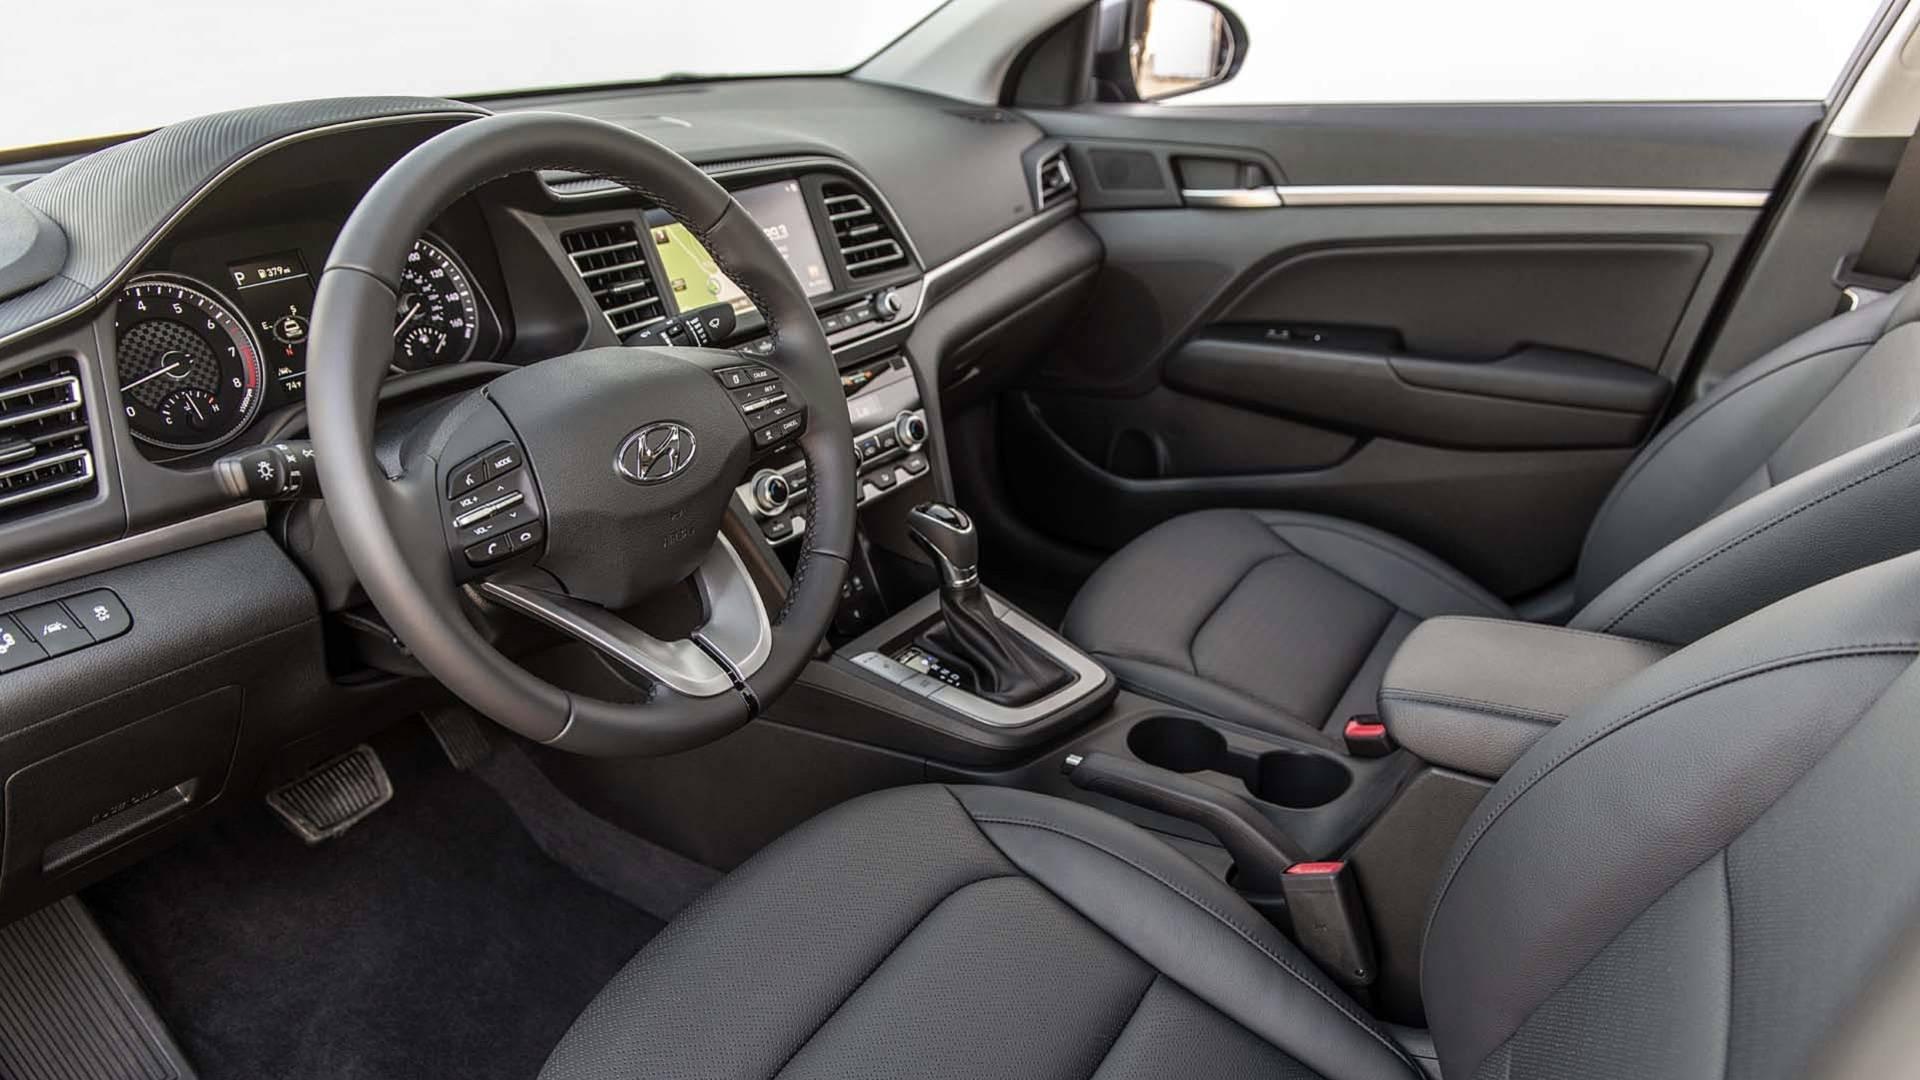 Hyundai Elantra 2019 (40)